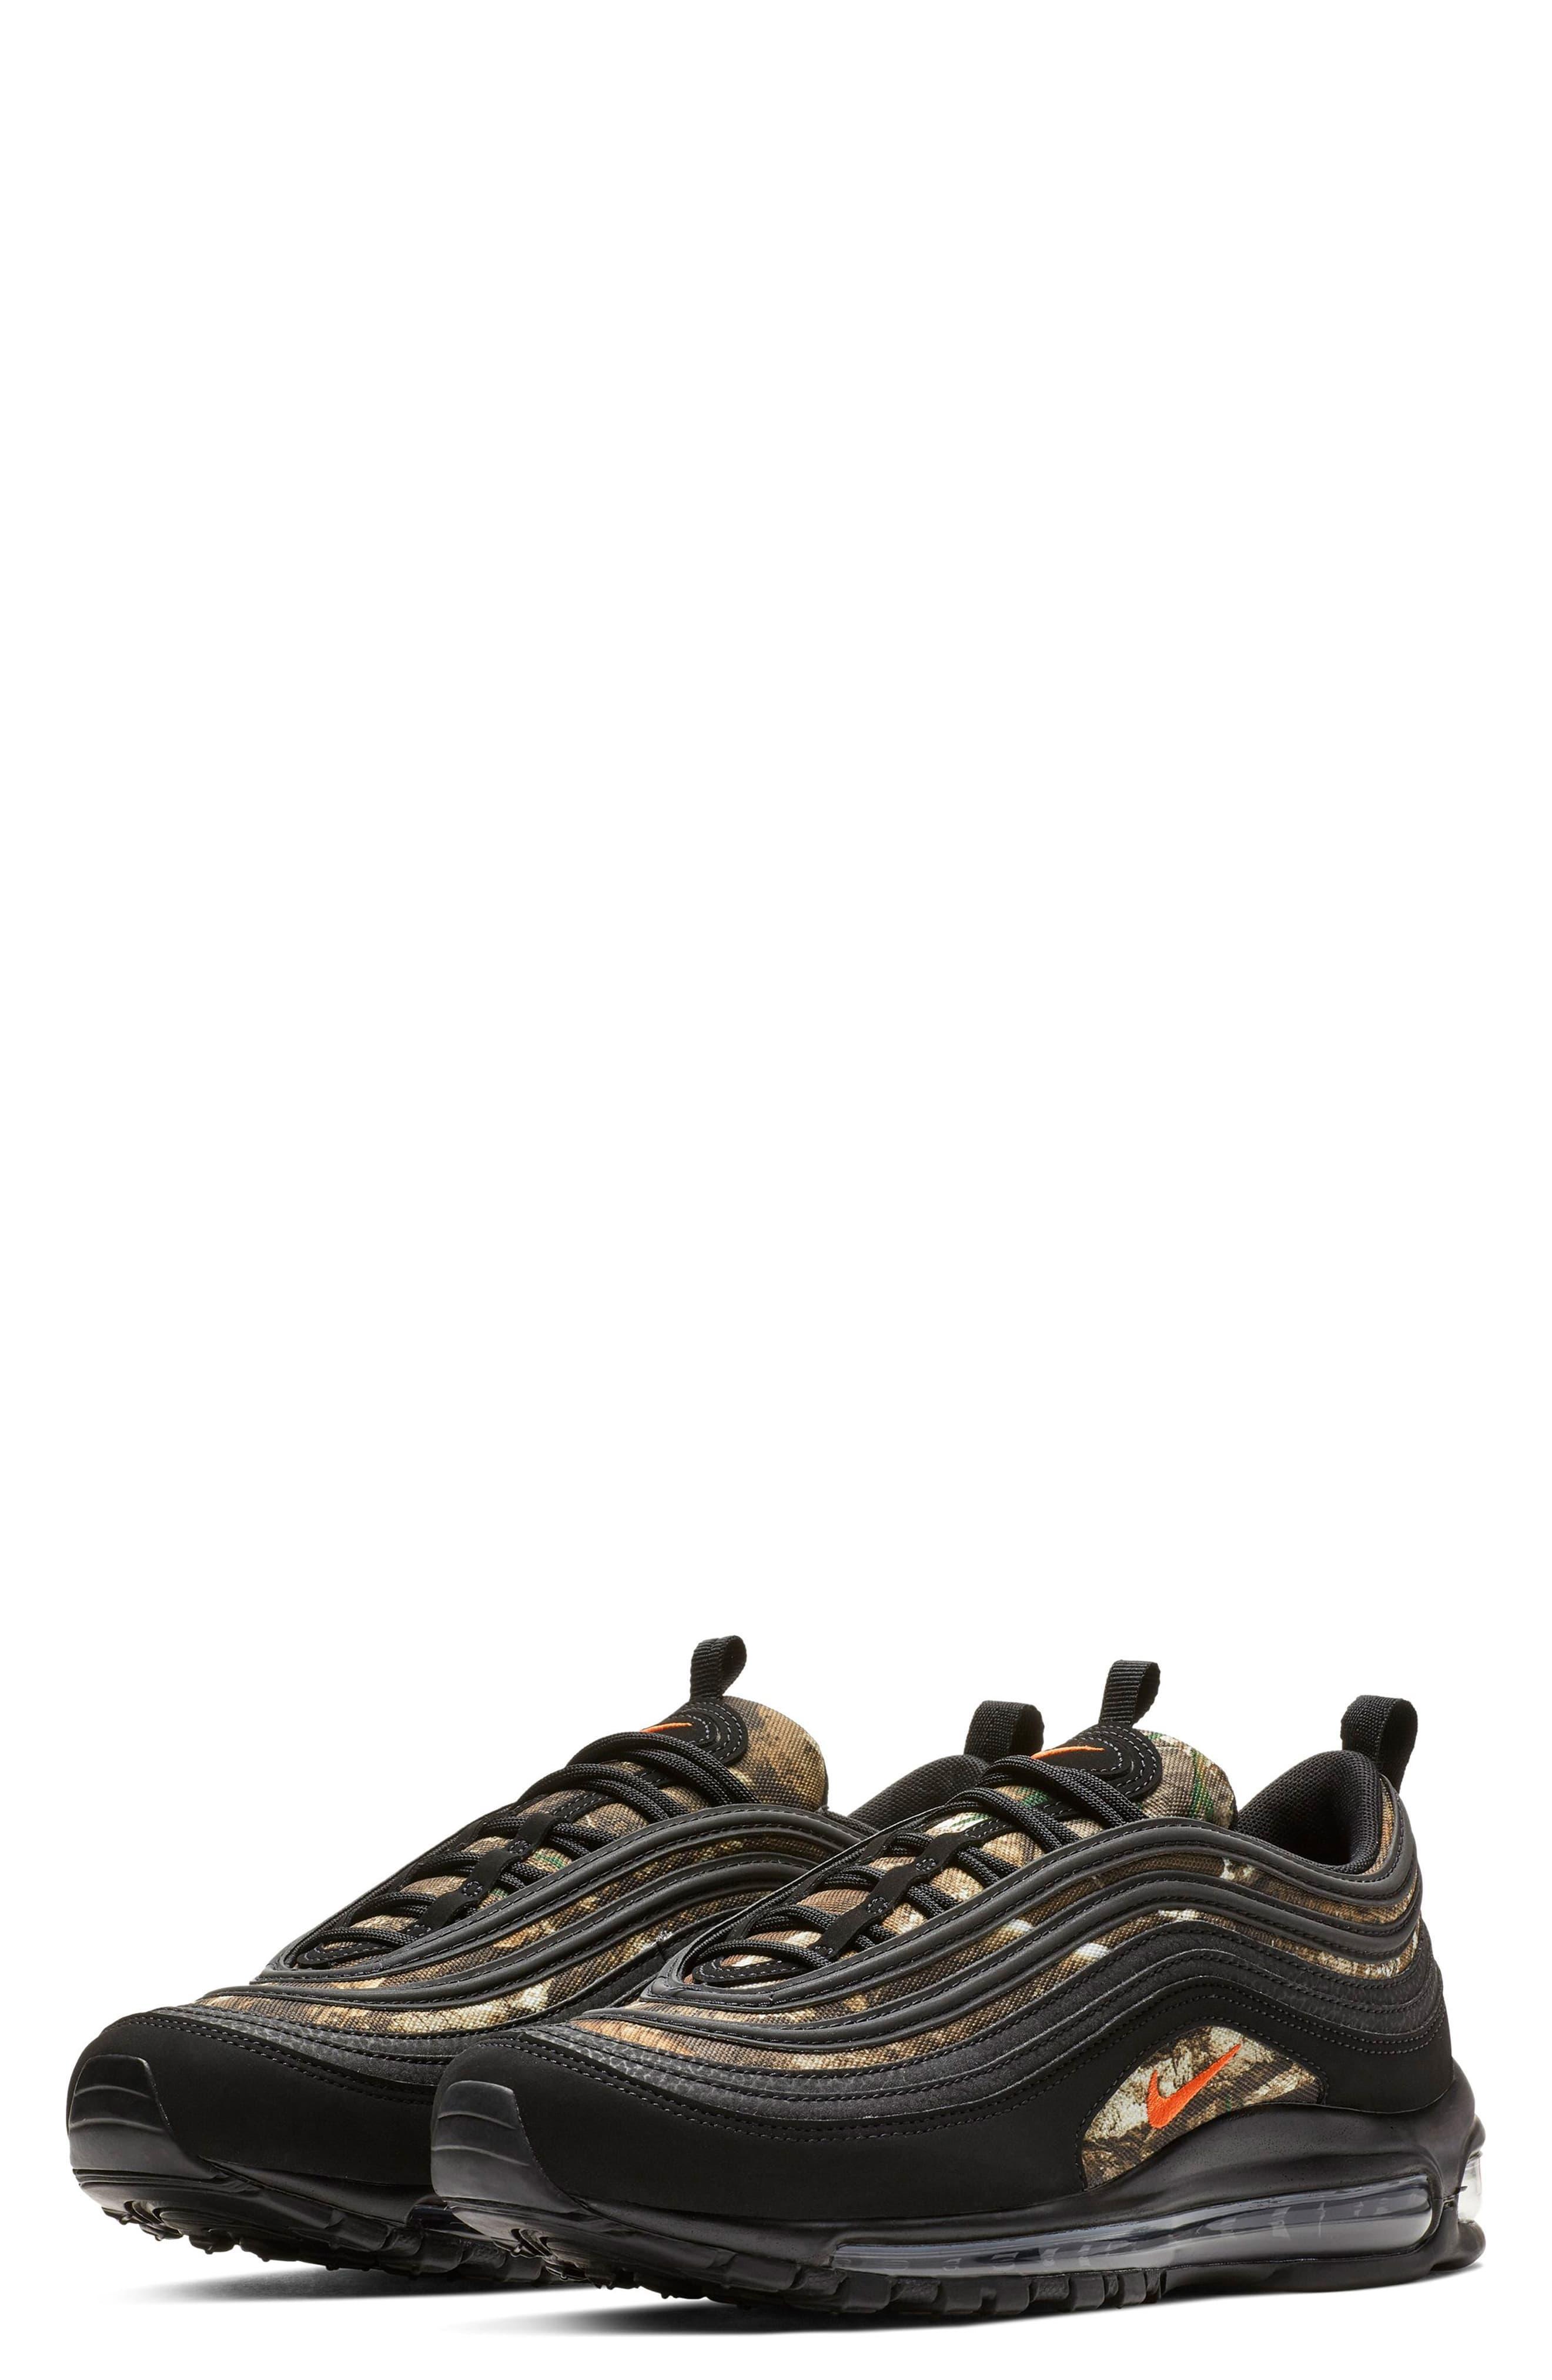 cb52b4f700f Nike Air Max 97 Rlt Sneaker in Black for Men - Lyst